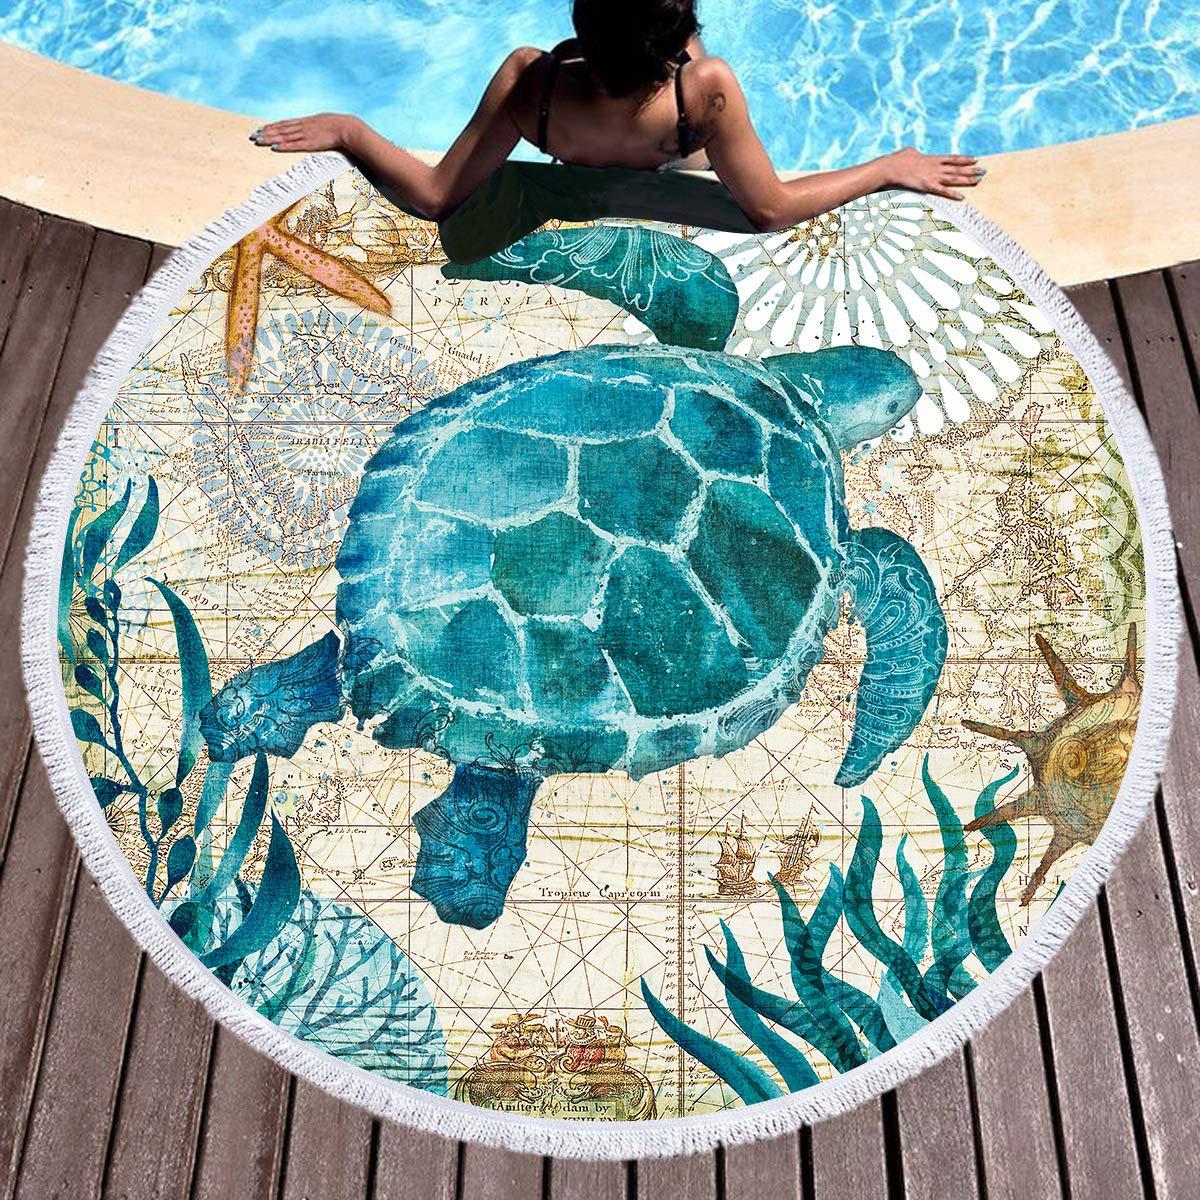 SearchI Toalla de Playa Redonda,Microfibra Mantas de Playa con Estampado de Animales Marinospara Tapices Decorativos Toalla Redonda Estera de Yoga Esterilla de Picnic Alfombras Manteles Mandala